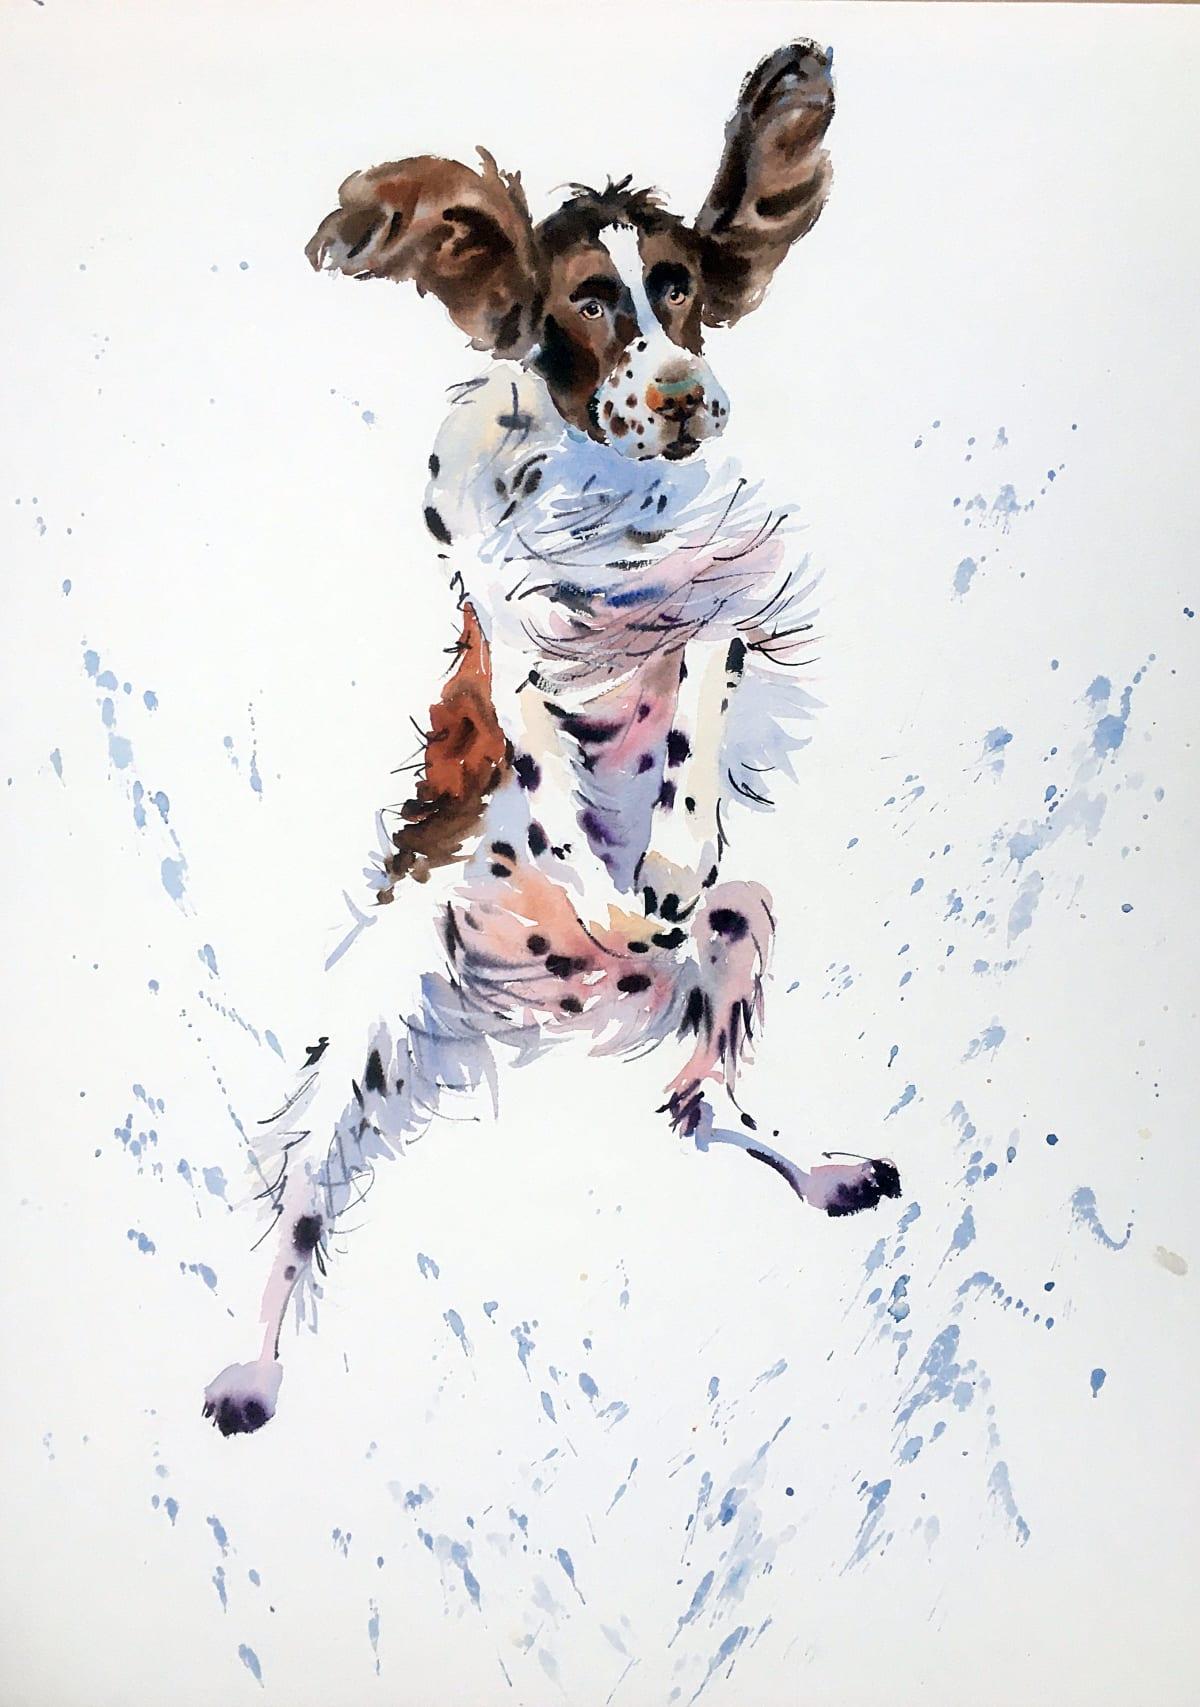 Jake Winkle SPRINGER HAS SPRUNG Watercolour 28 x 20 in 71.1 x 50.8 cm